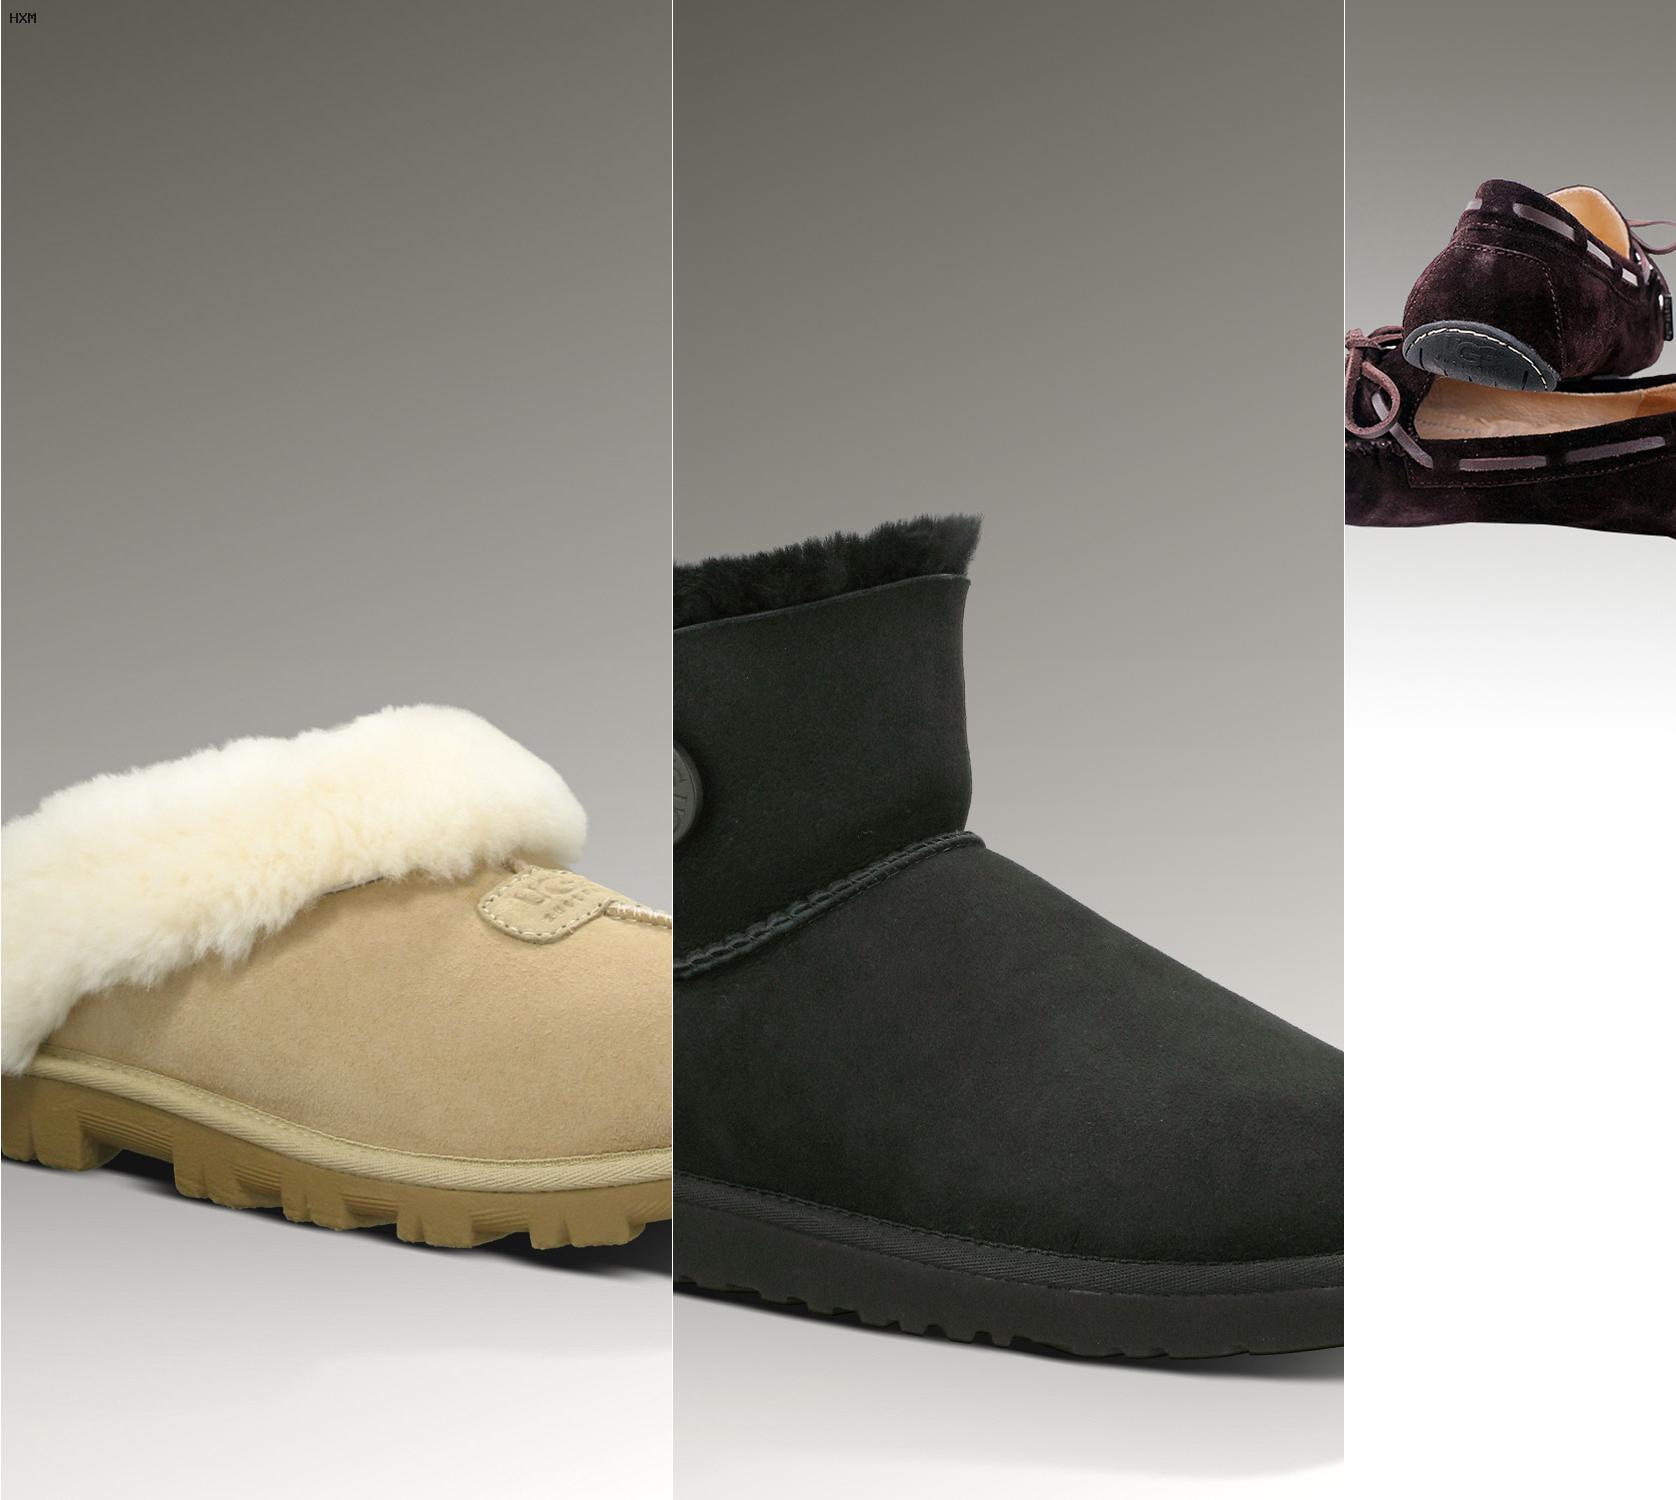 chaussures ugg lyon